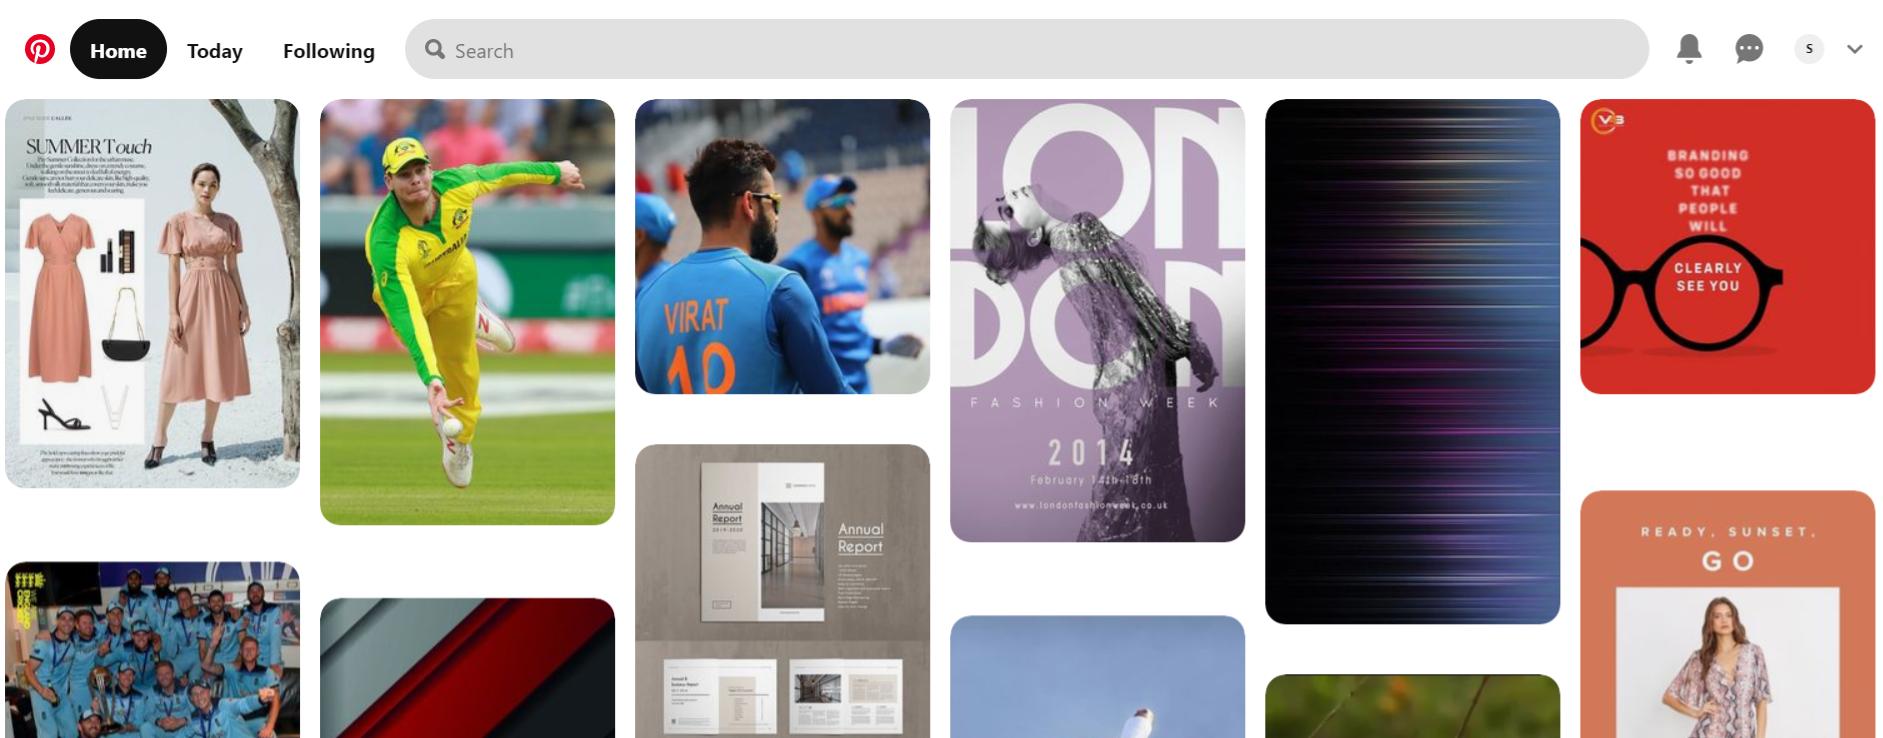 Pinterest: Collaborative bookmarking tools